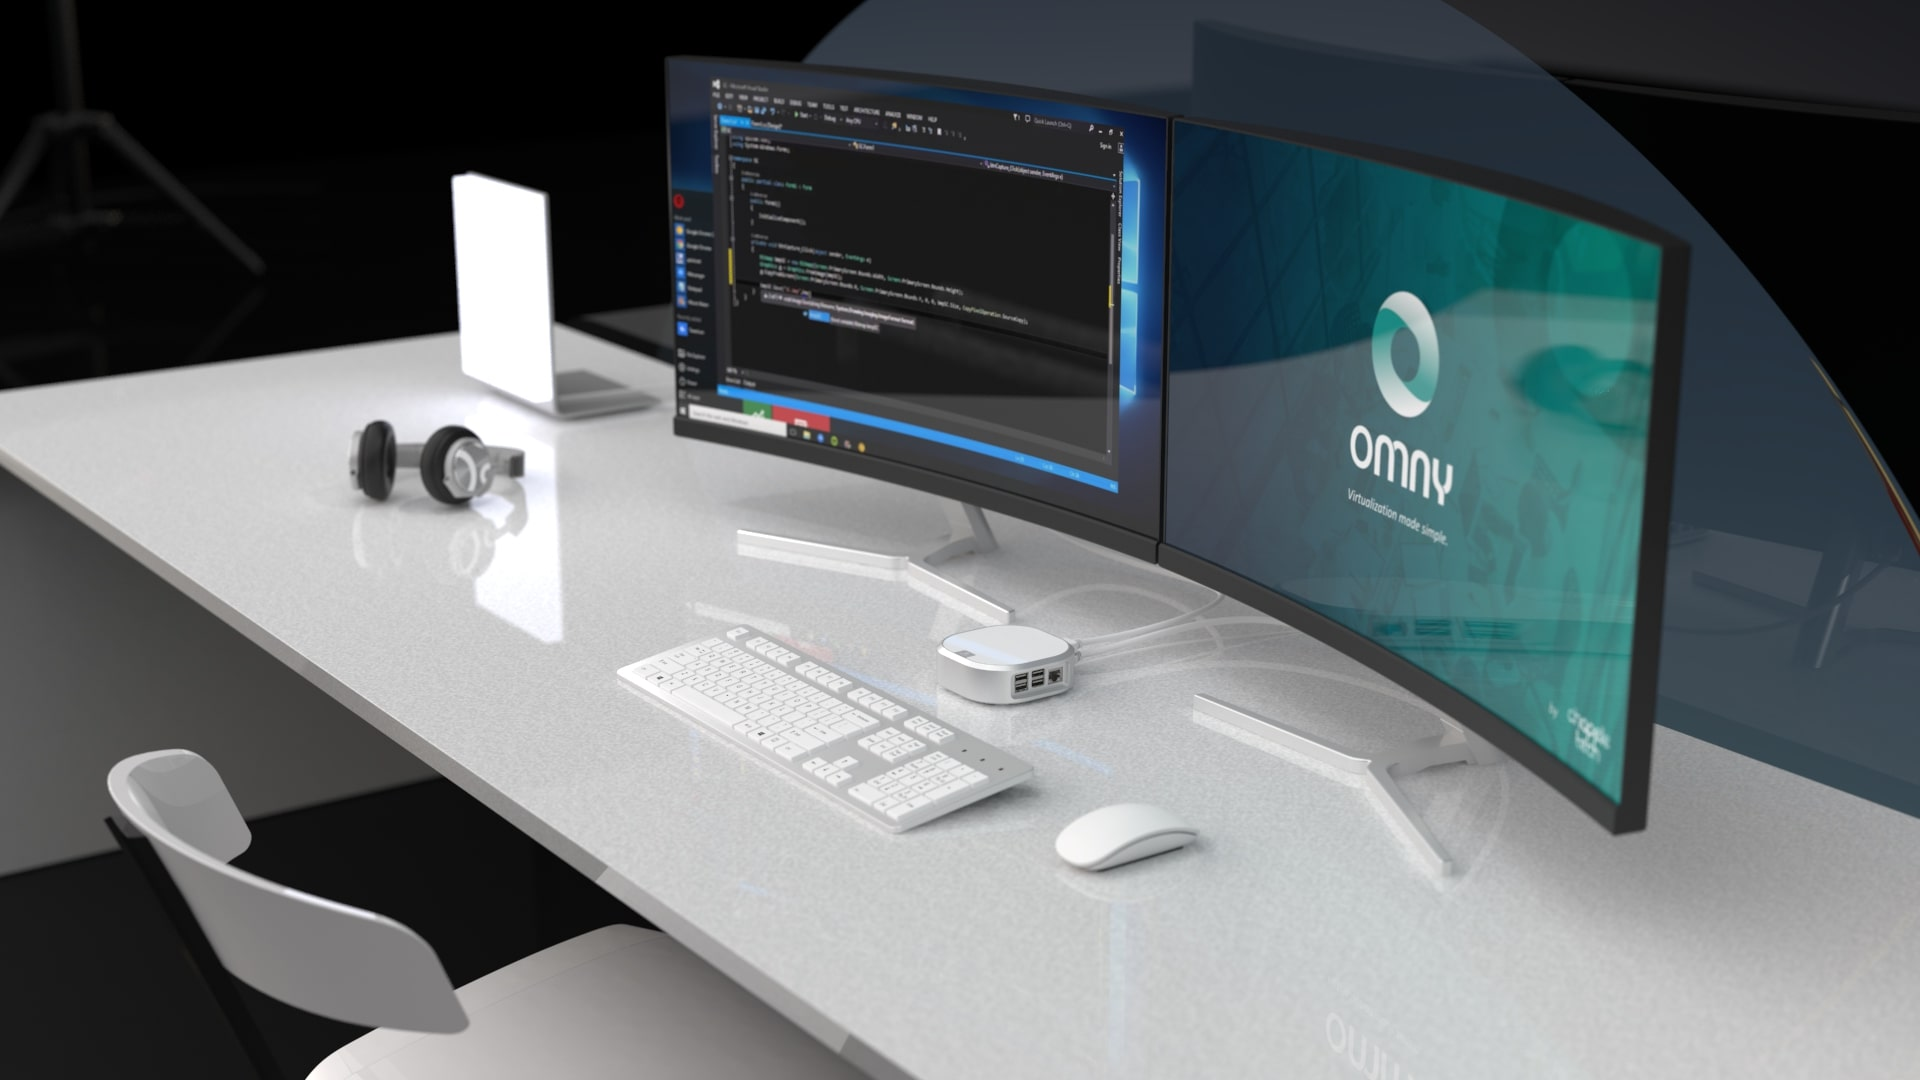 Bureau blanc avec la solution de virtualisation Omny